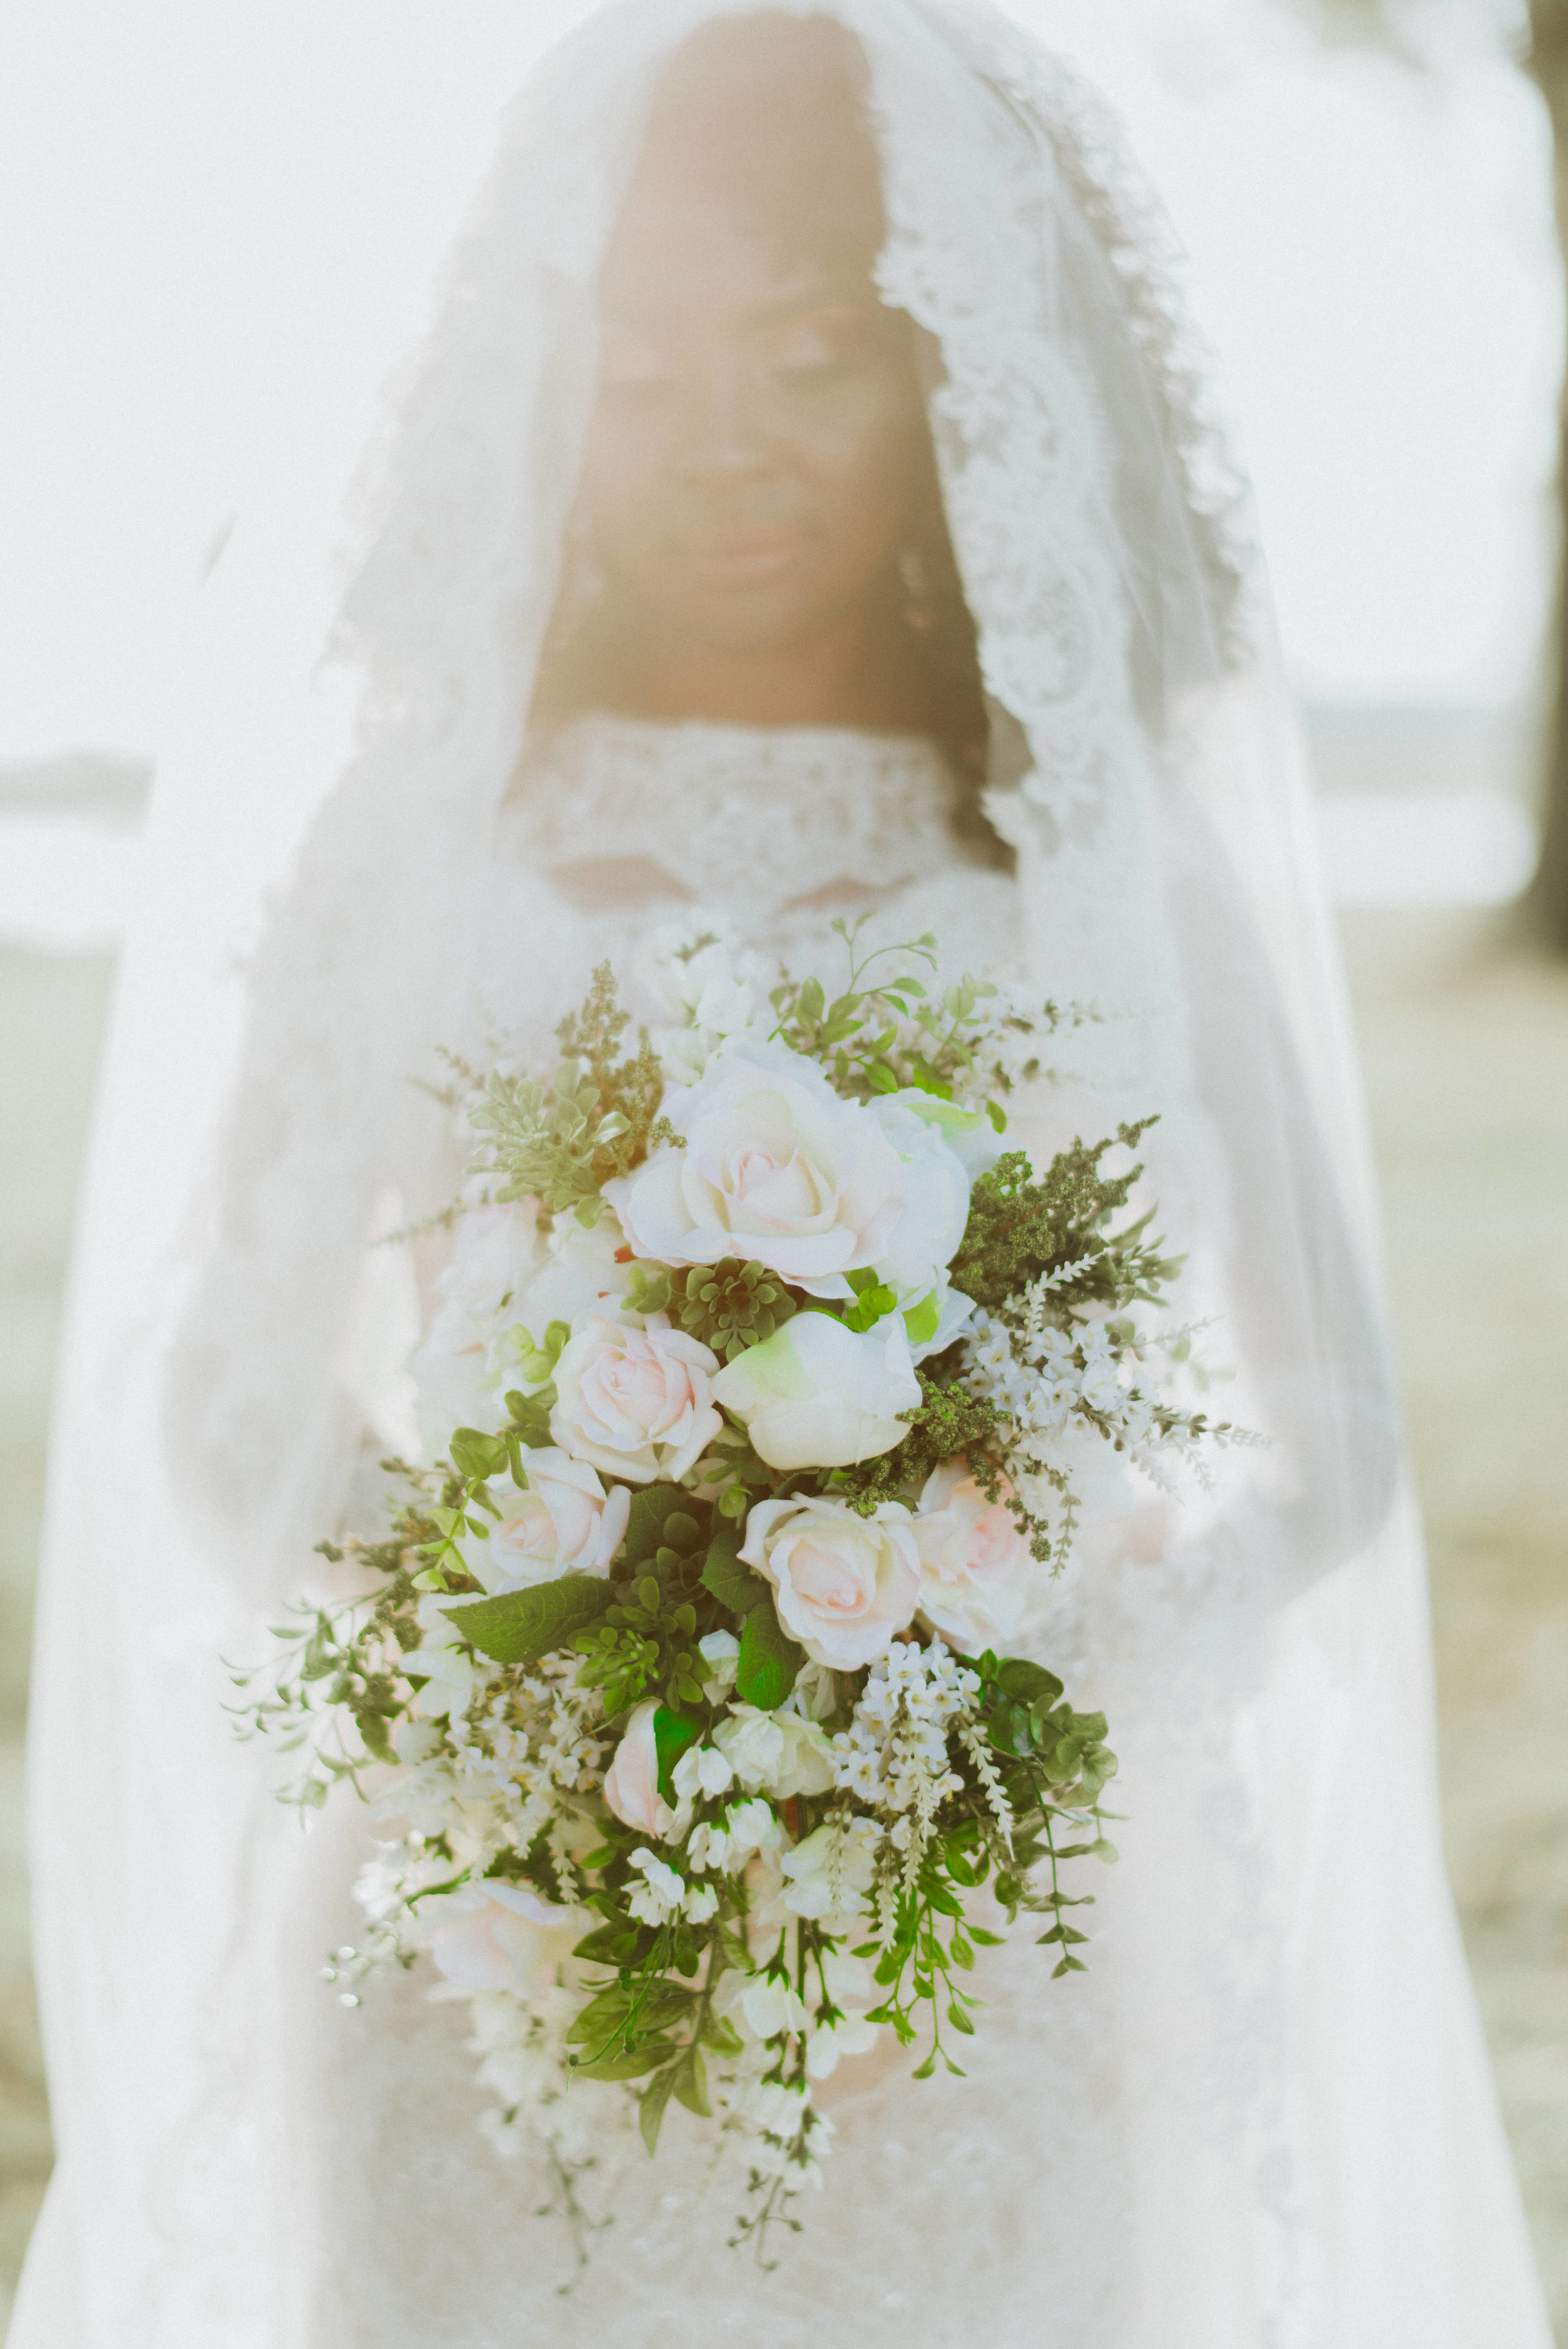 Jalainna's Bridals - 020.jpg